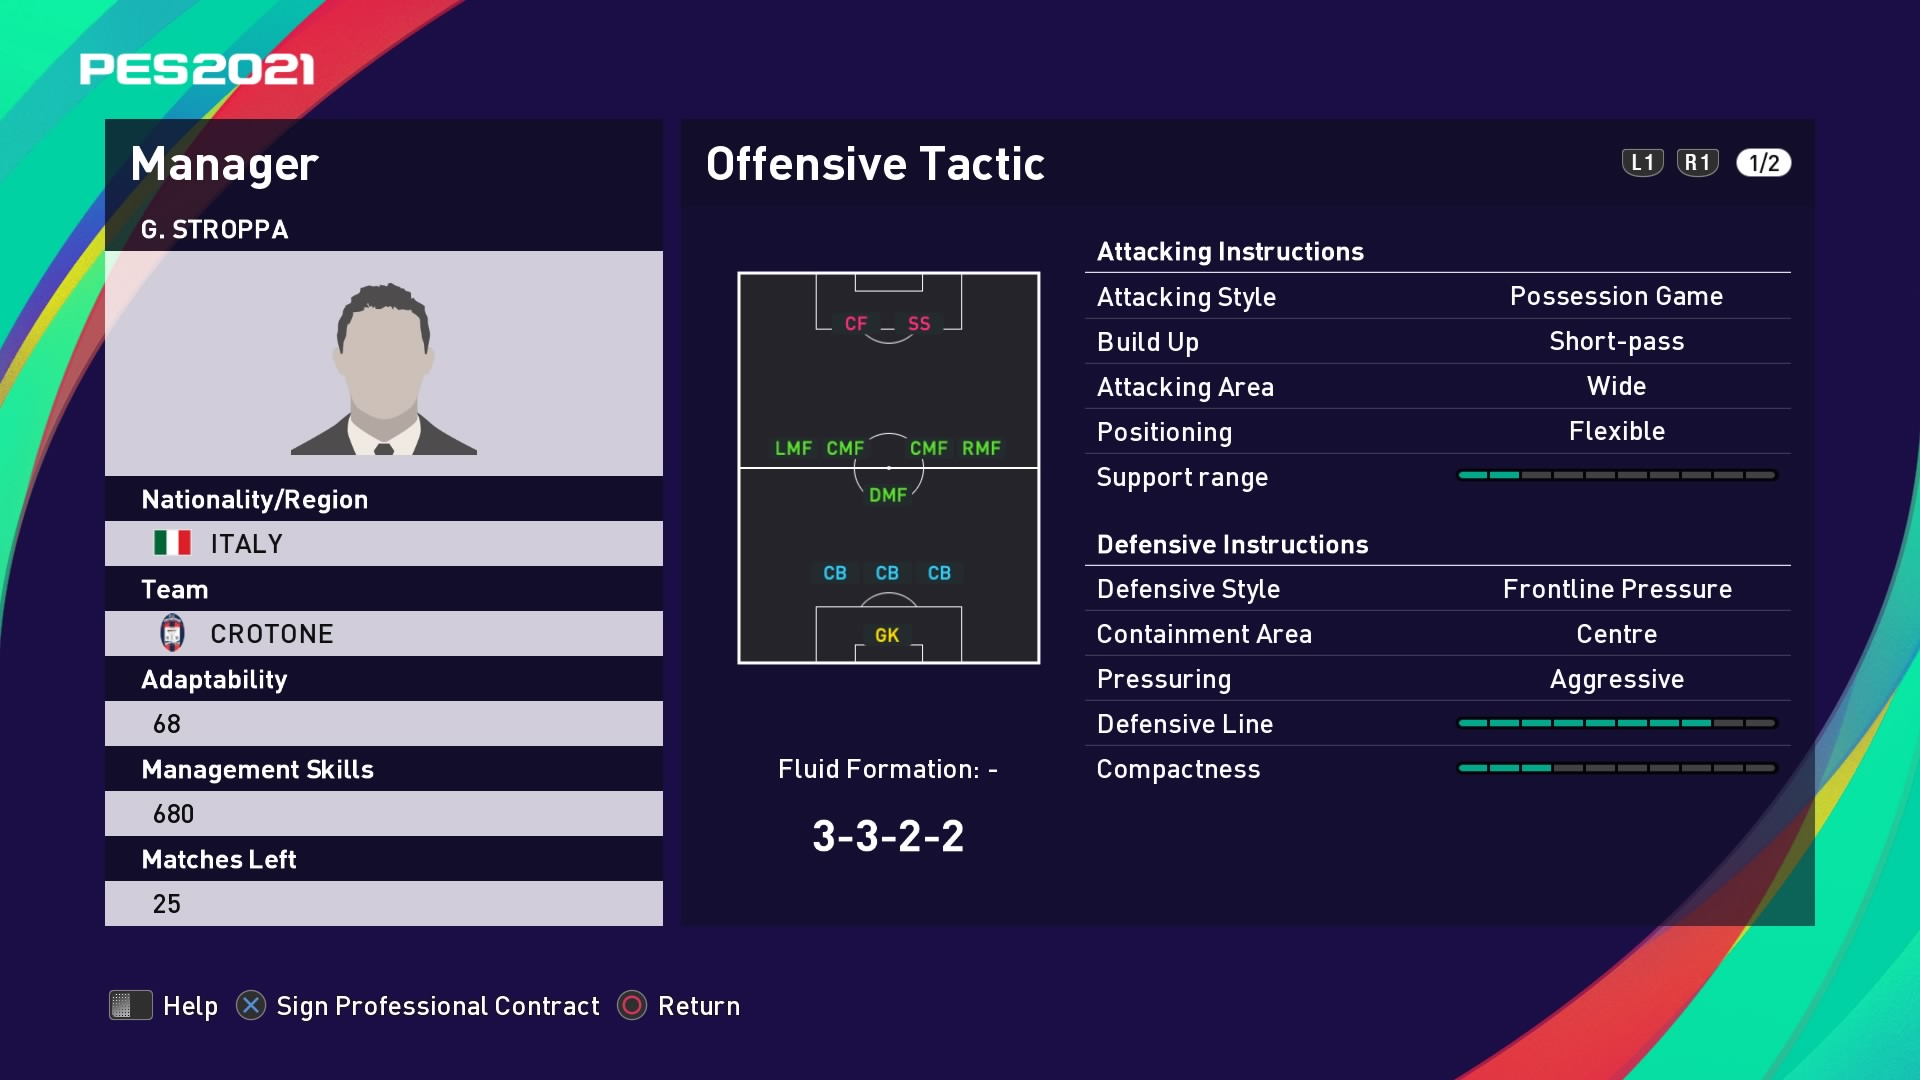 G. Stroppa (Giovanni Stroppa) Offensive Tactic in PES 2021 myClub